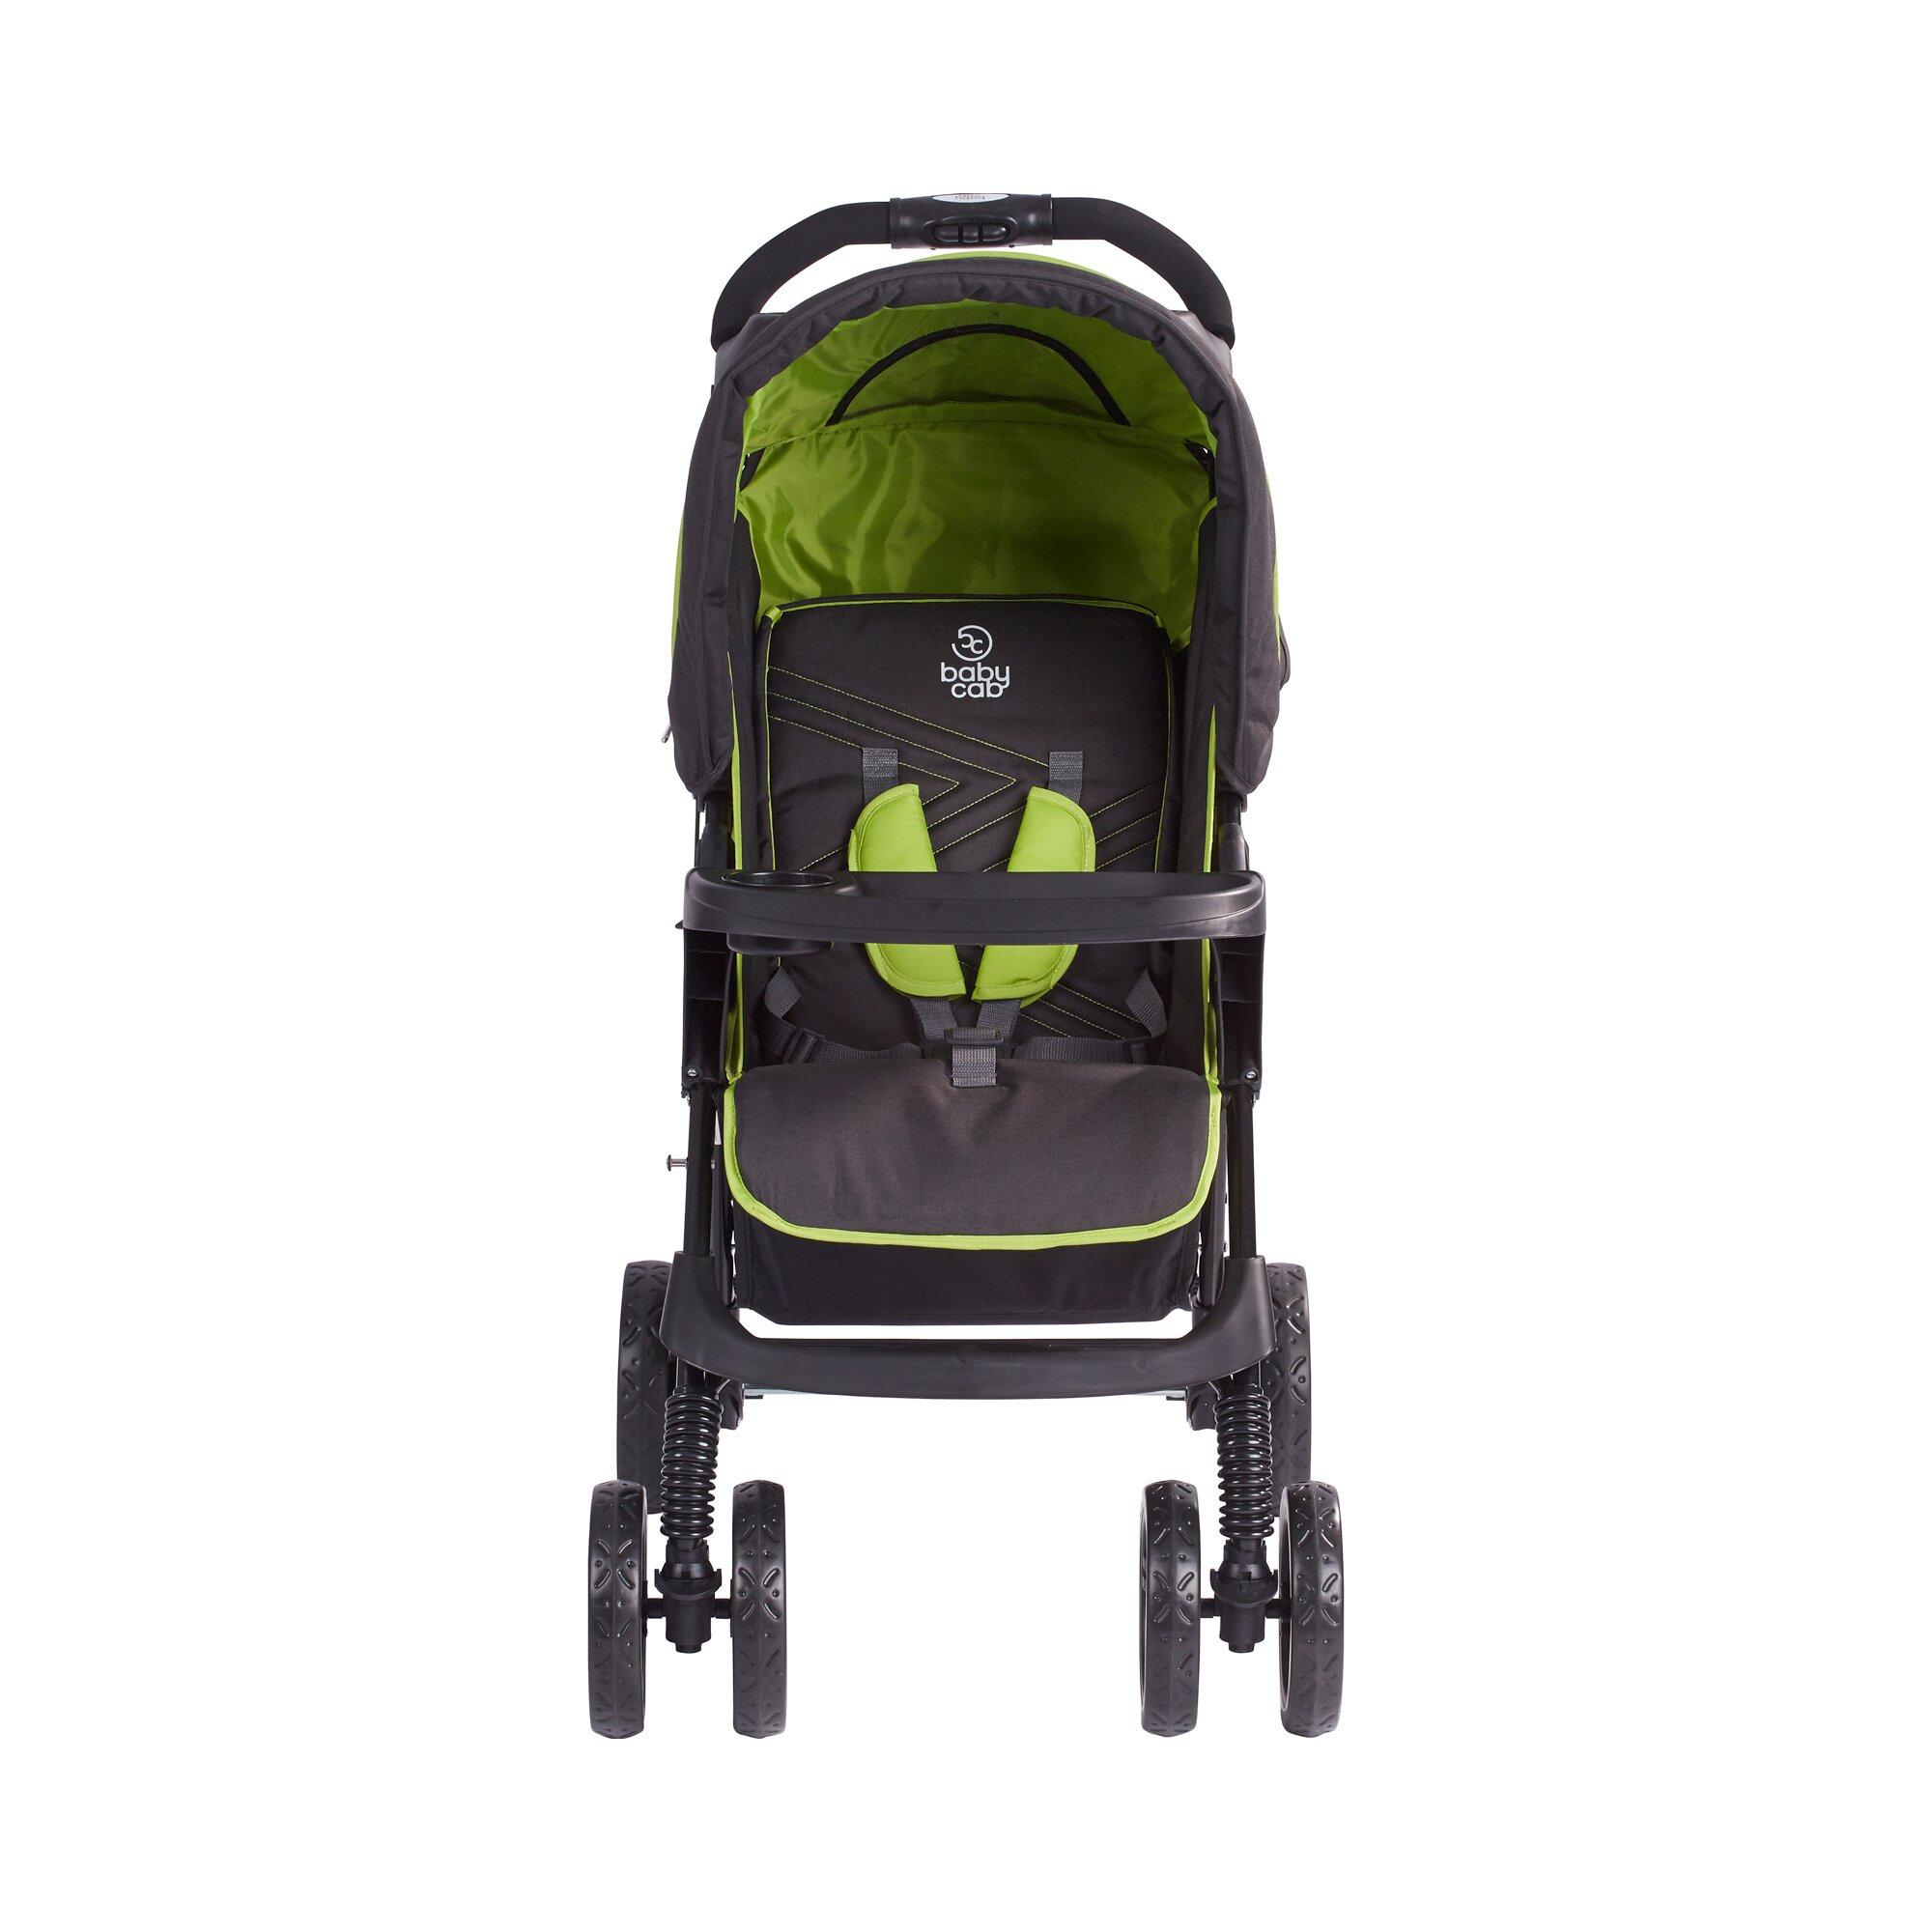 babycab-joe-kinderwagen-sportwagen-schwarz